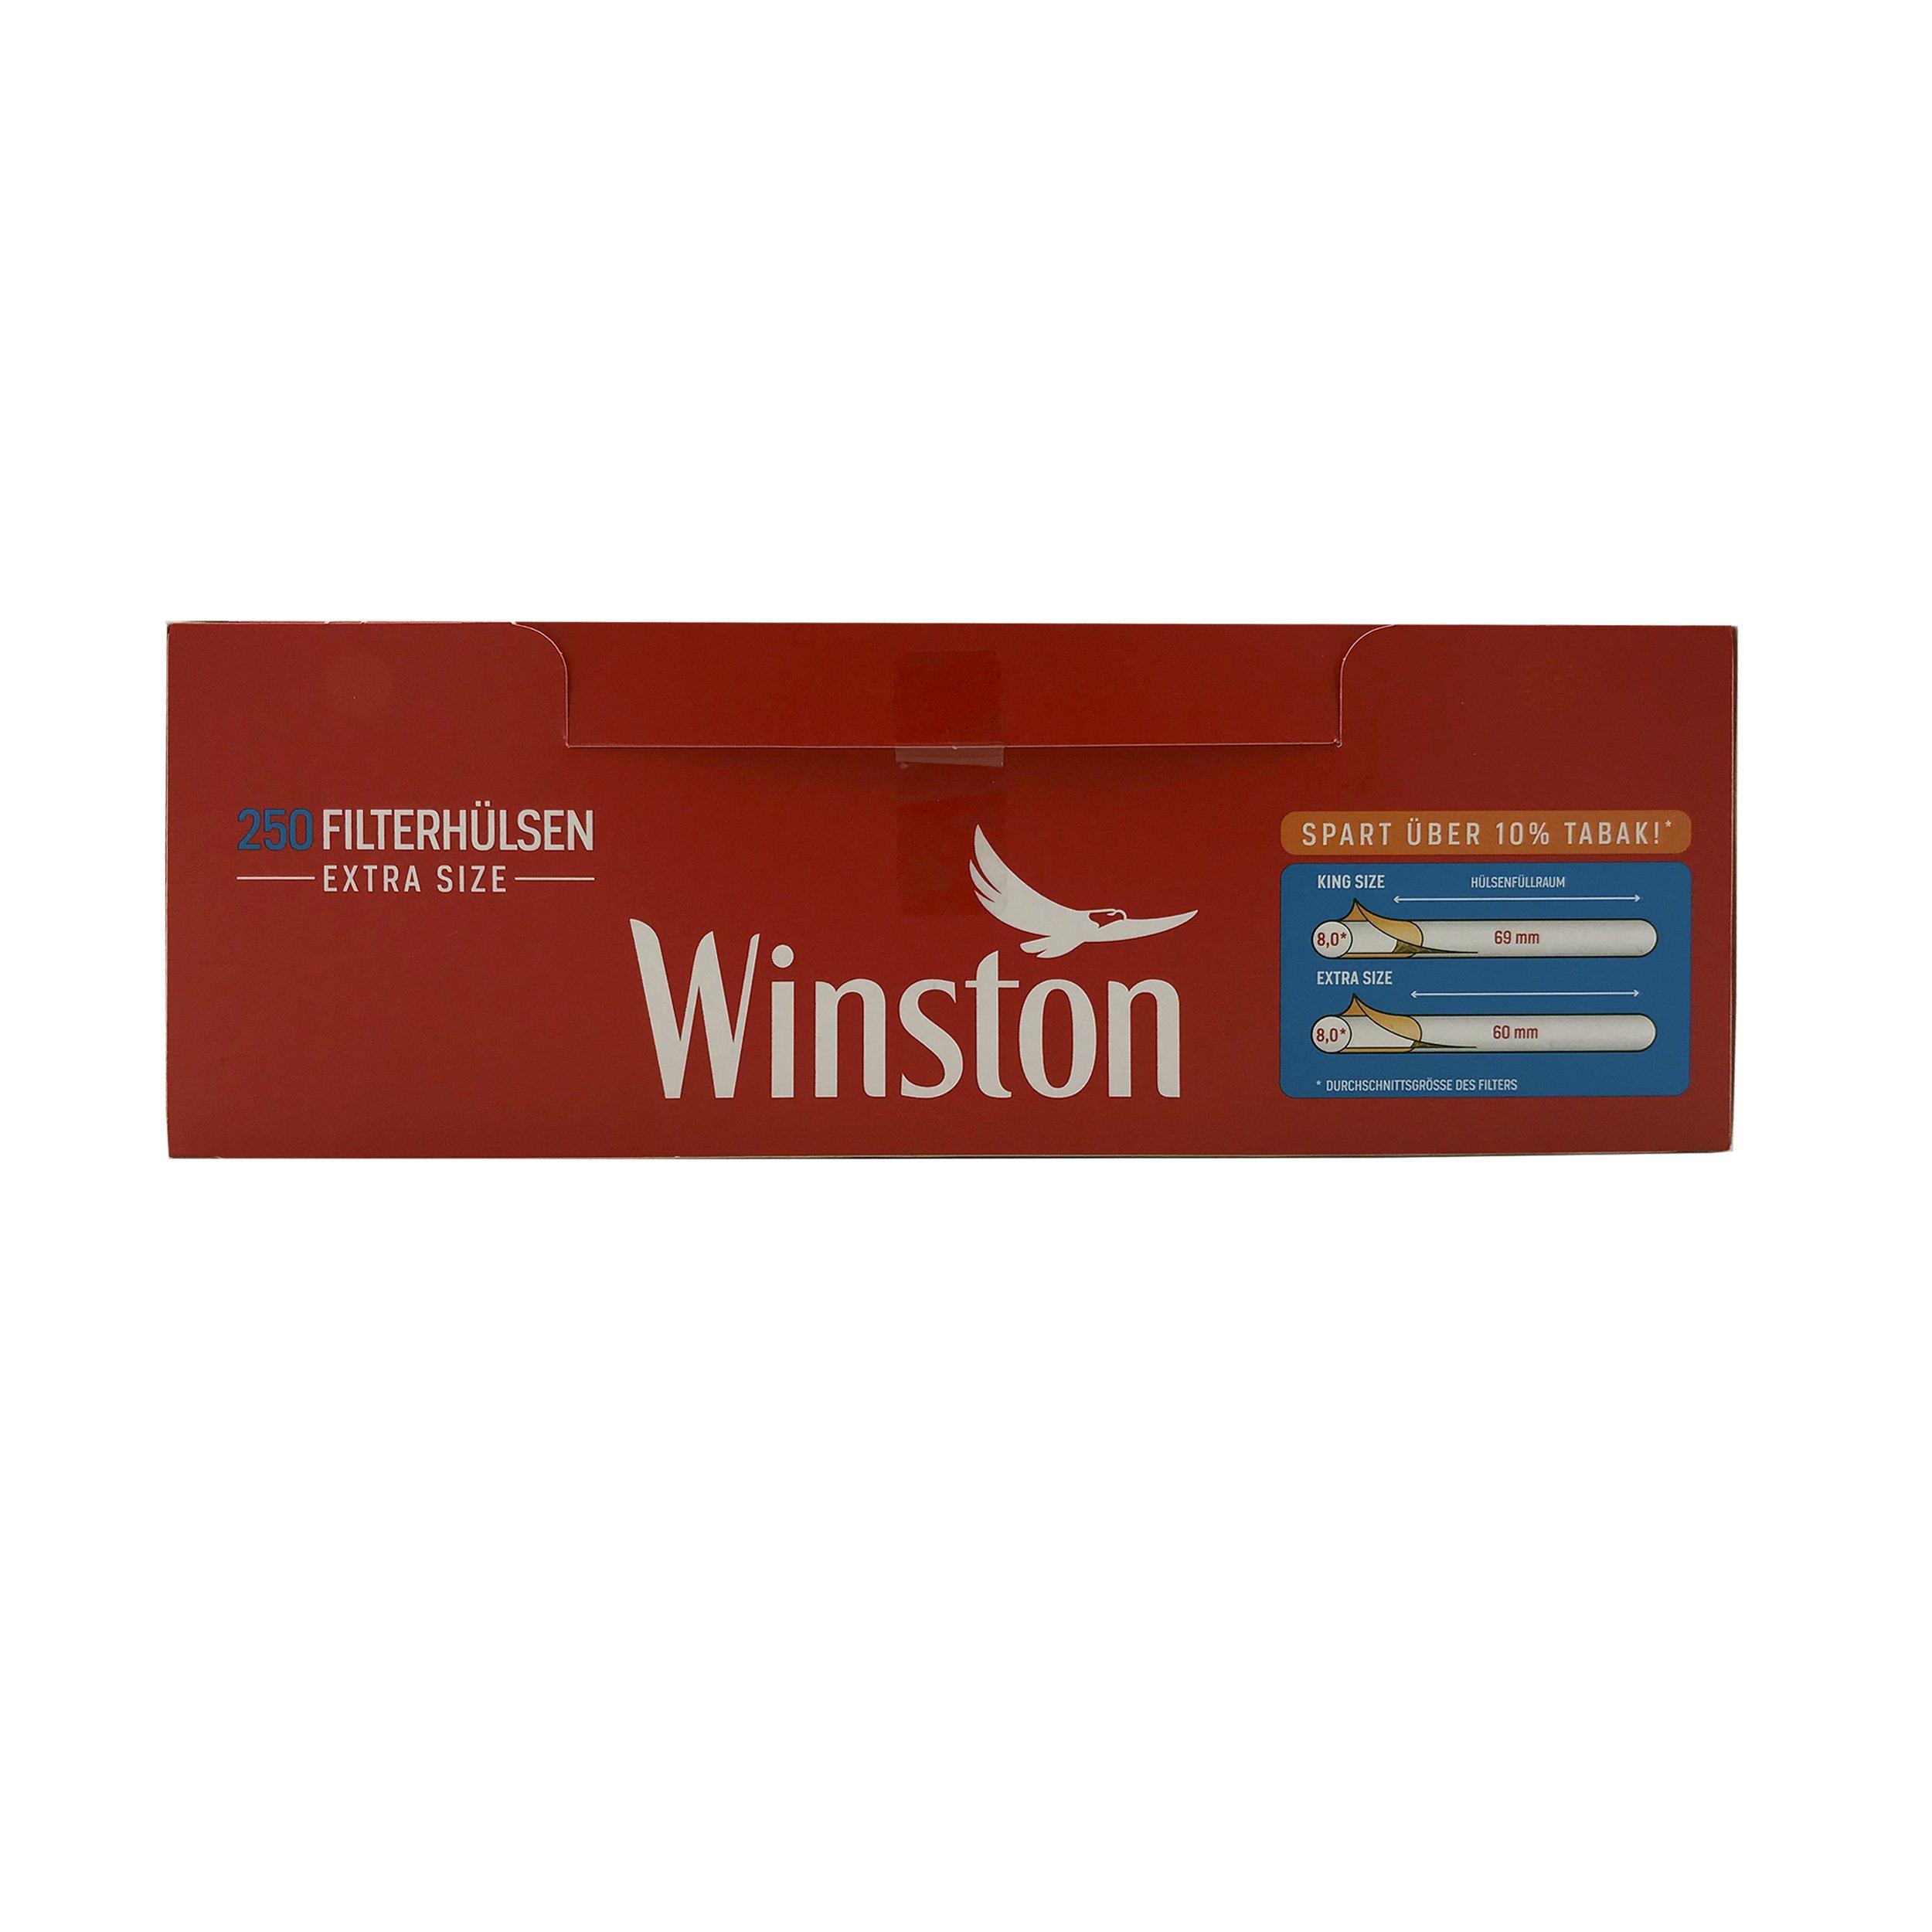 Winston King Size Filterhülsen 1 Pack